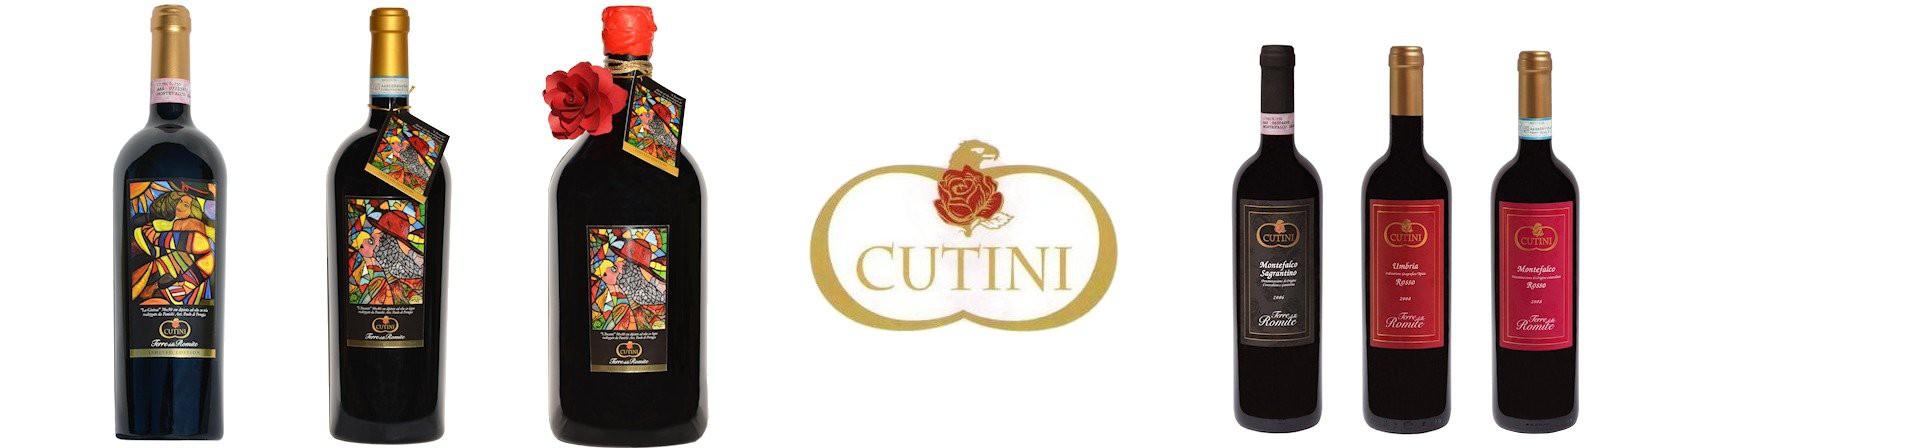 Cantina CUTINI - Vini dell'Umbria - vendita online